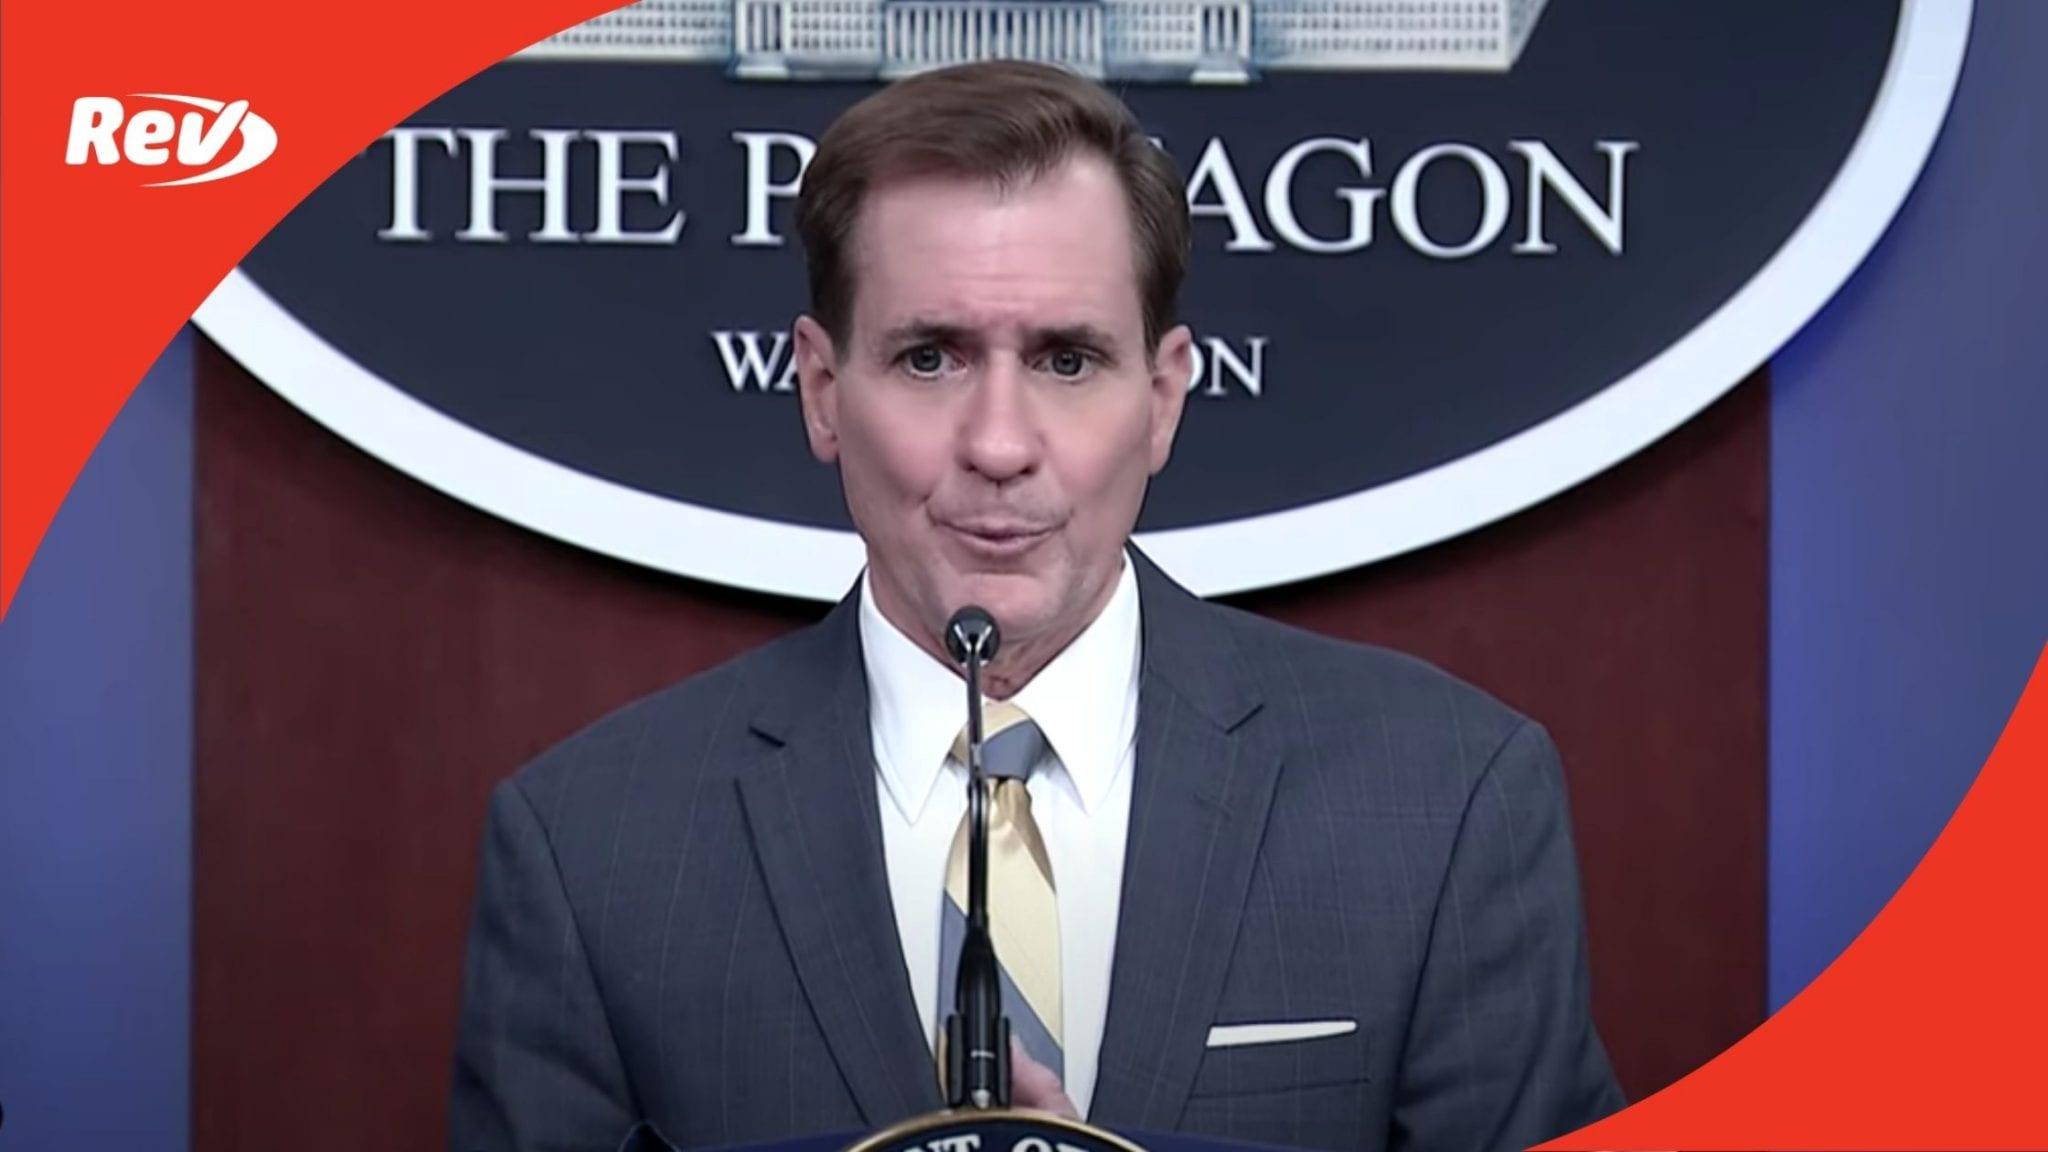 Pentagon Press Secretary John Kirby Press Briefing Transcript February 8